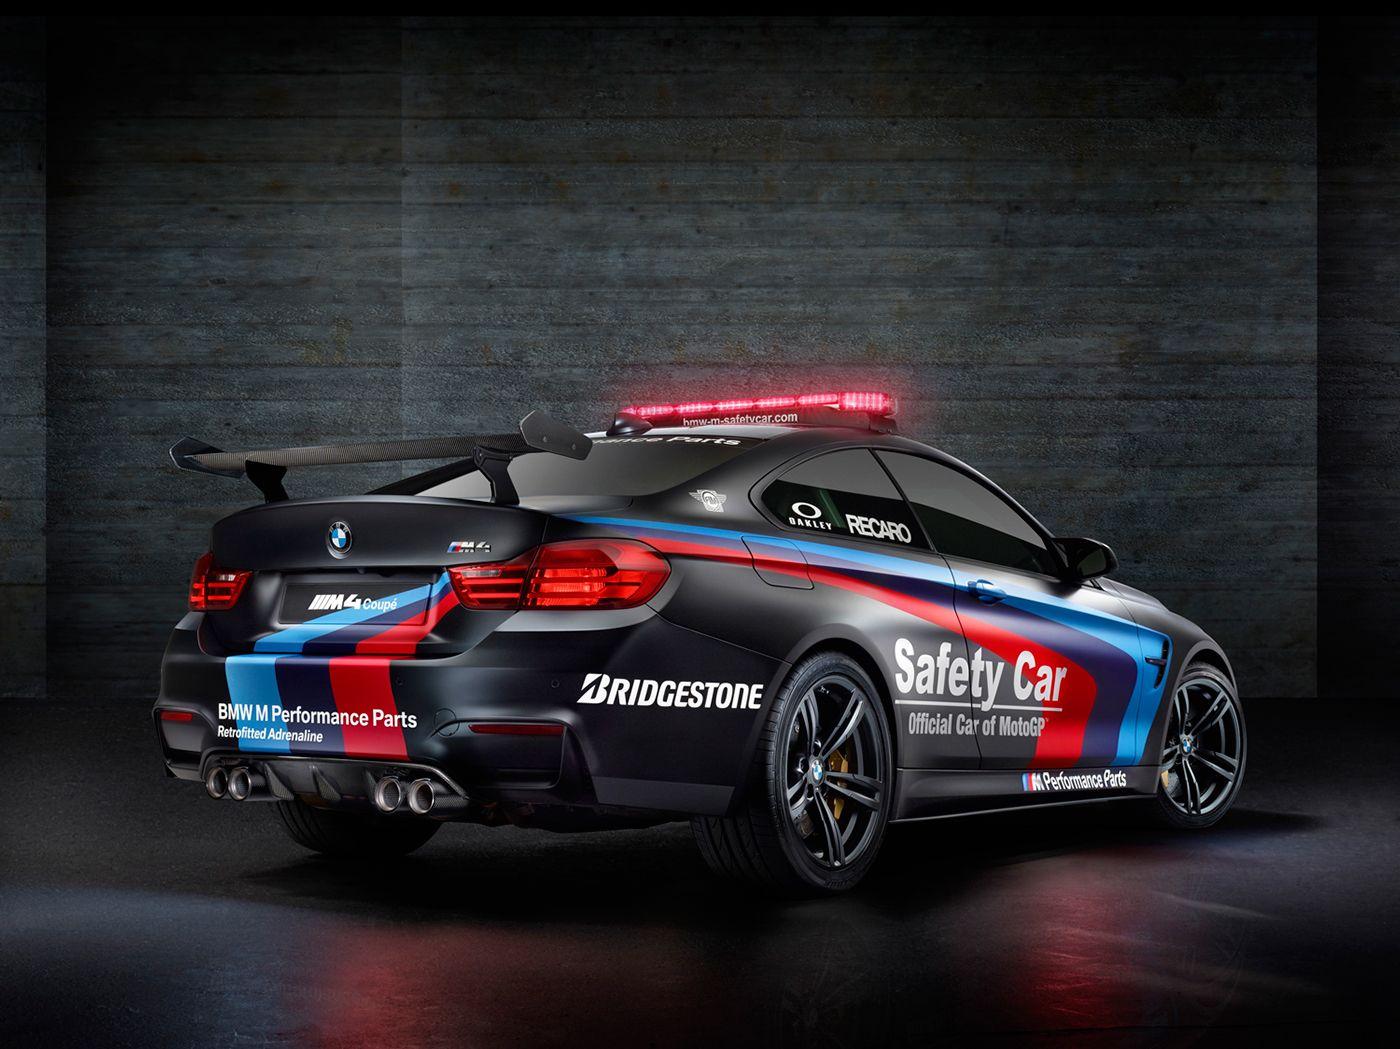 BMW M GmbH Official MotoGP M4 Safety Car 2015 on Behance